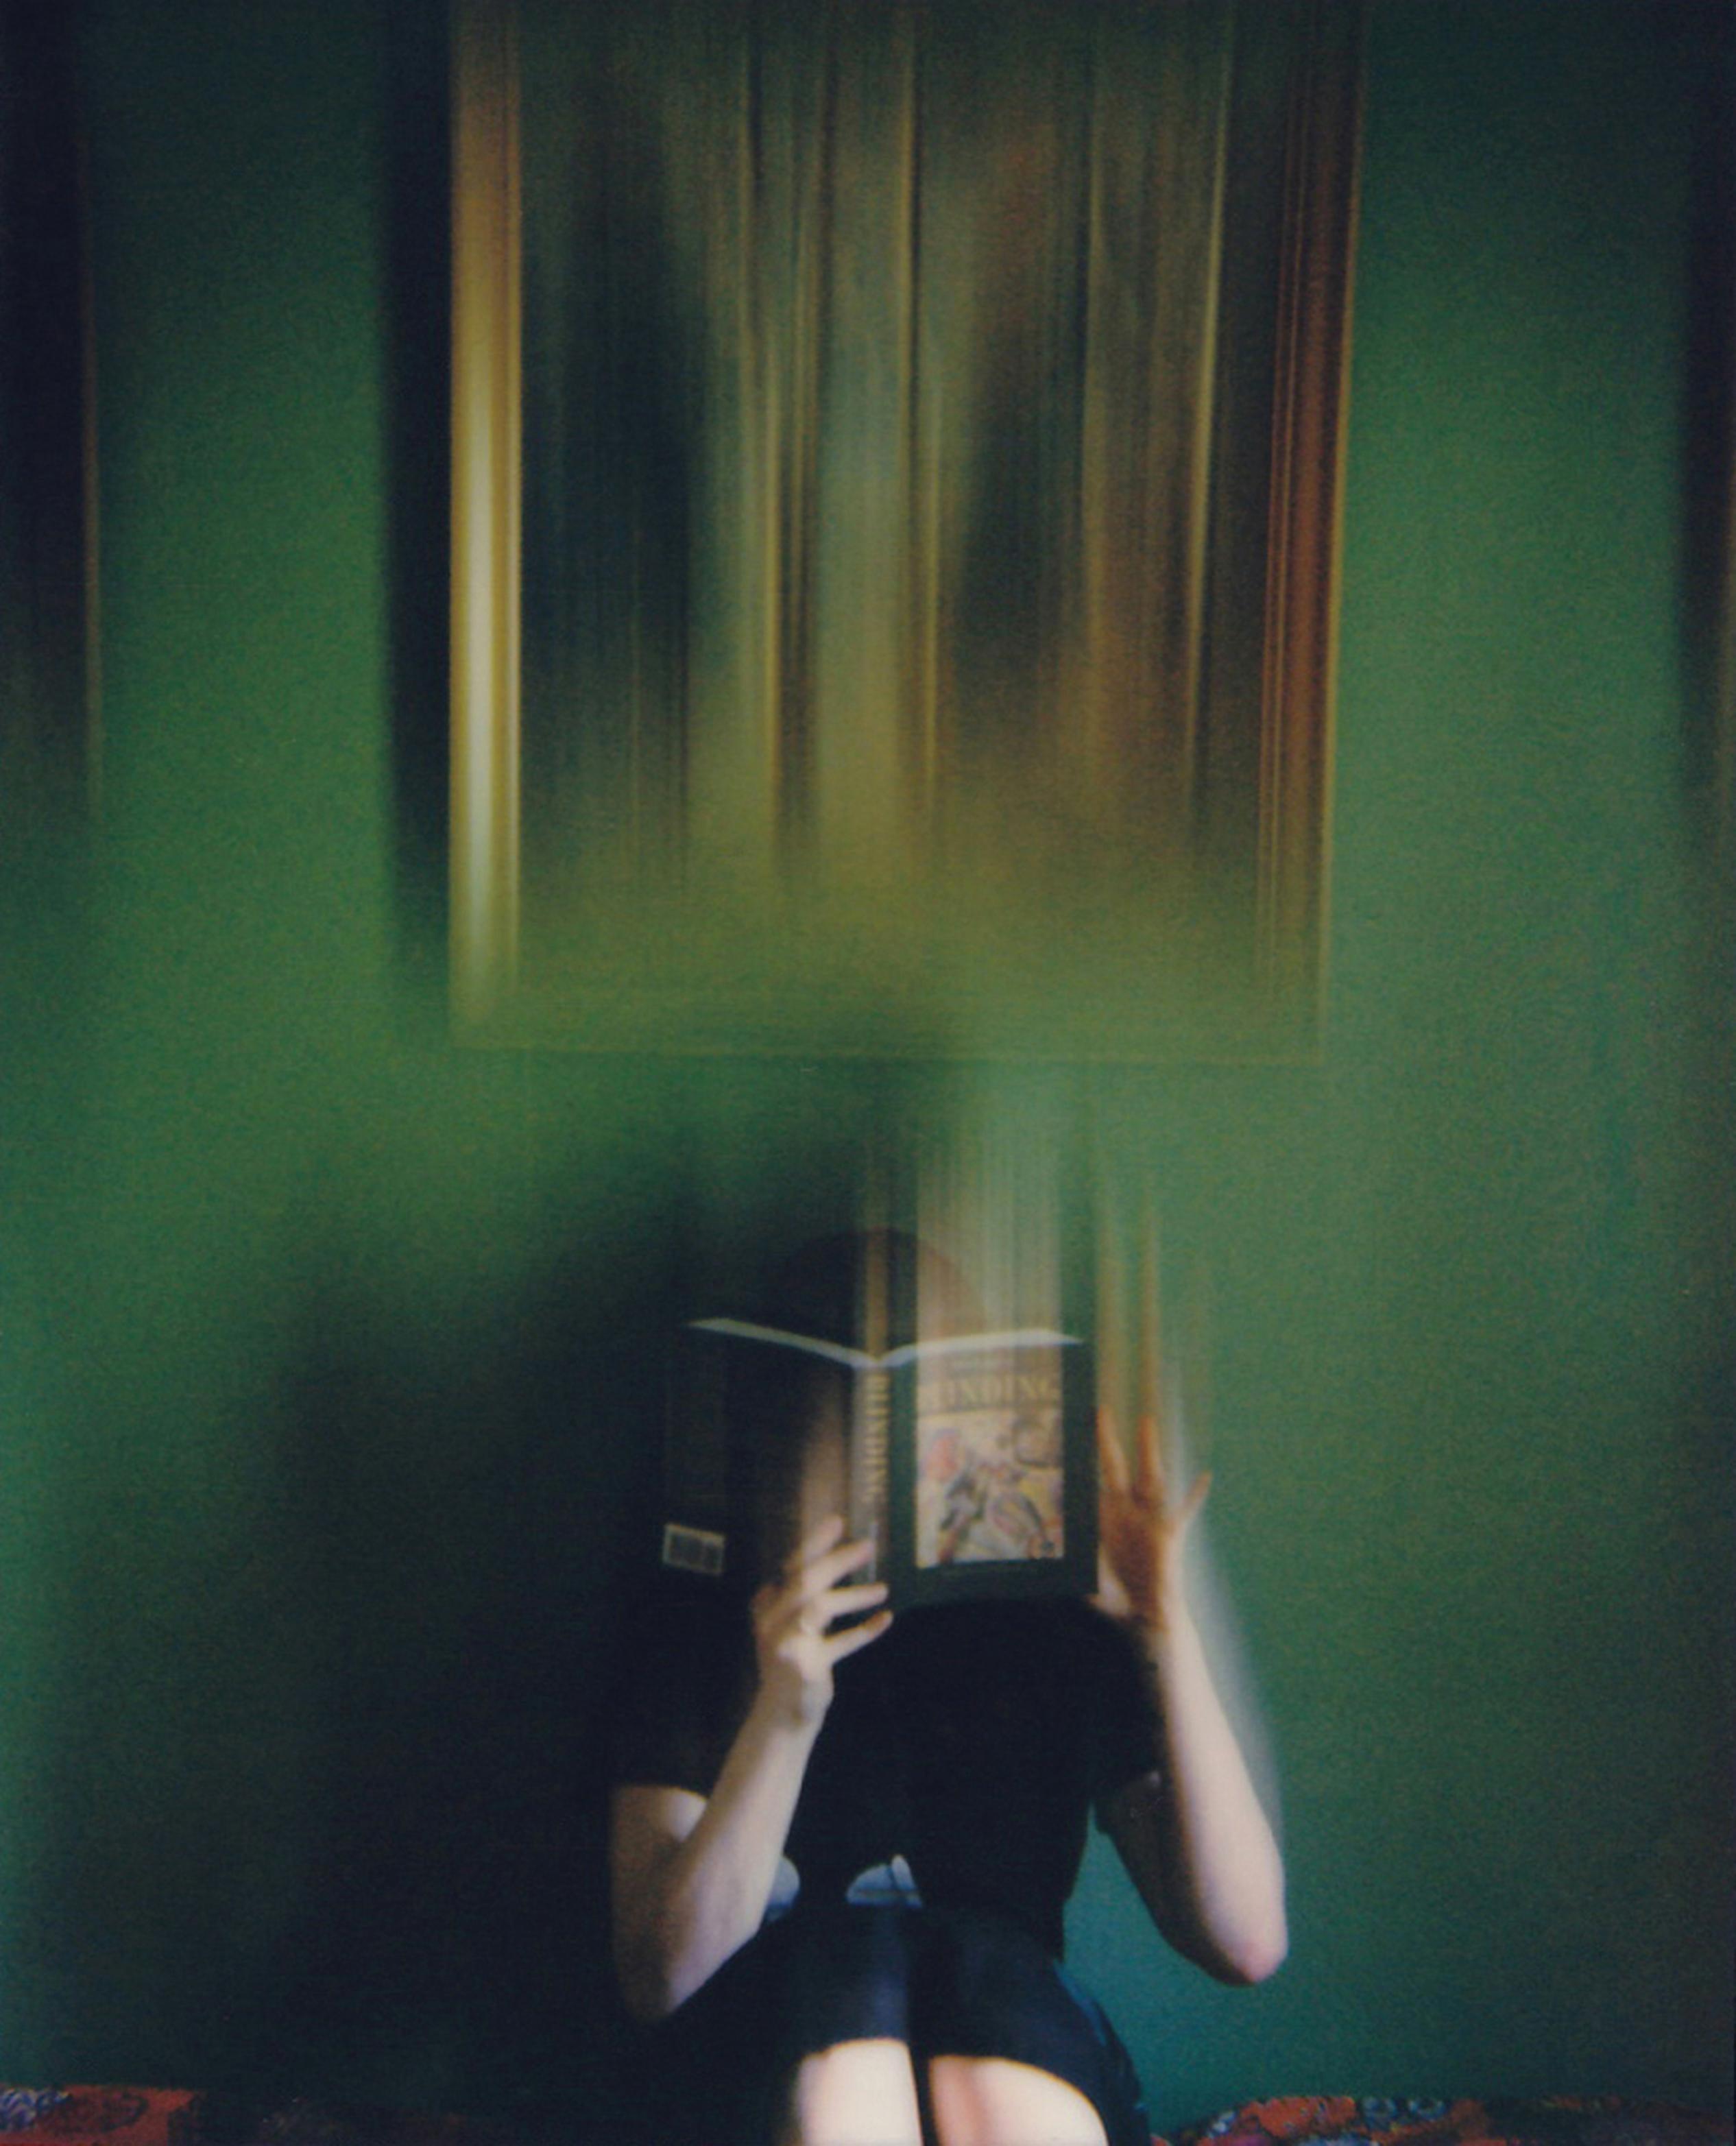 Blinding - Contemporary, Figurative, Woman, Polaroid, Photograph, 21st Century